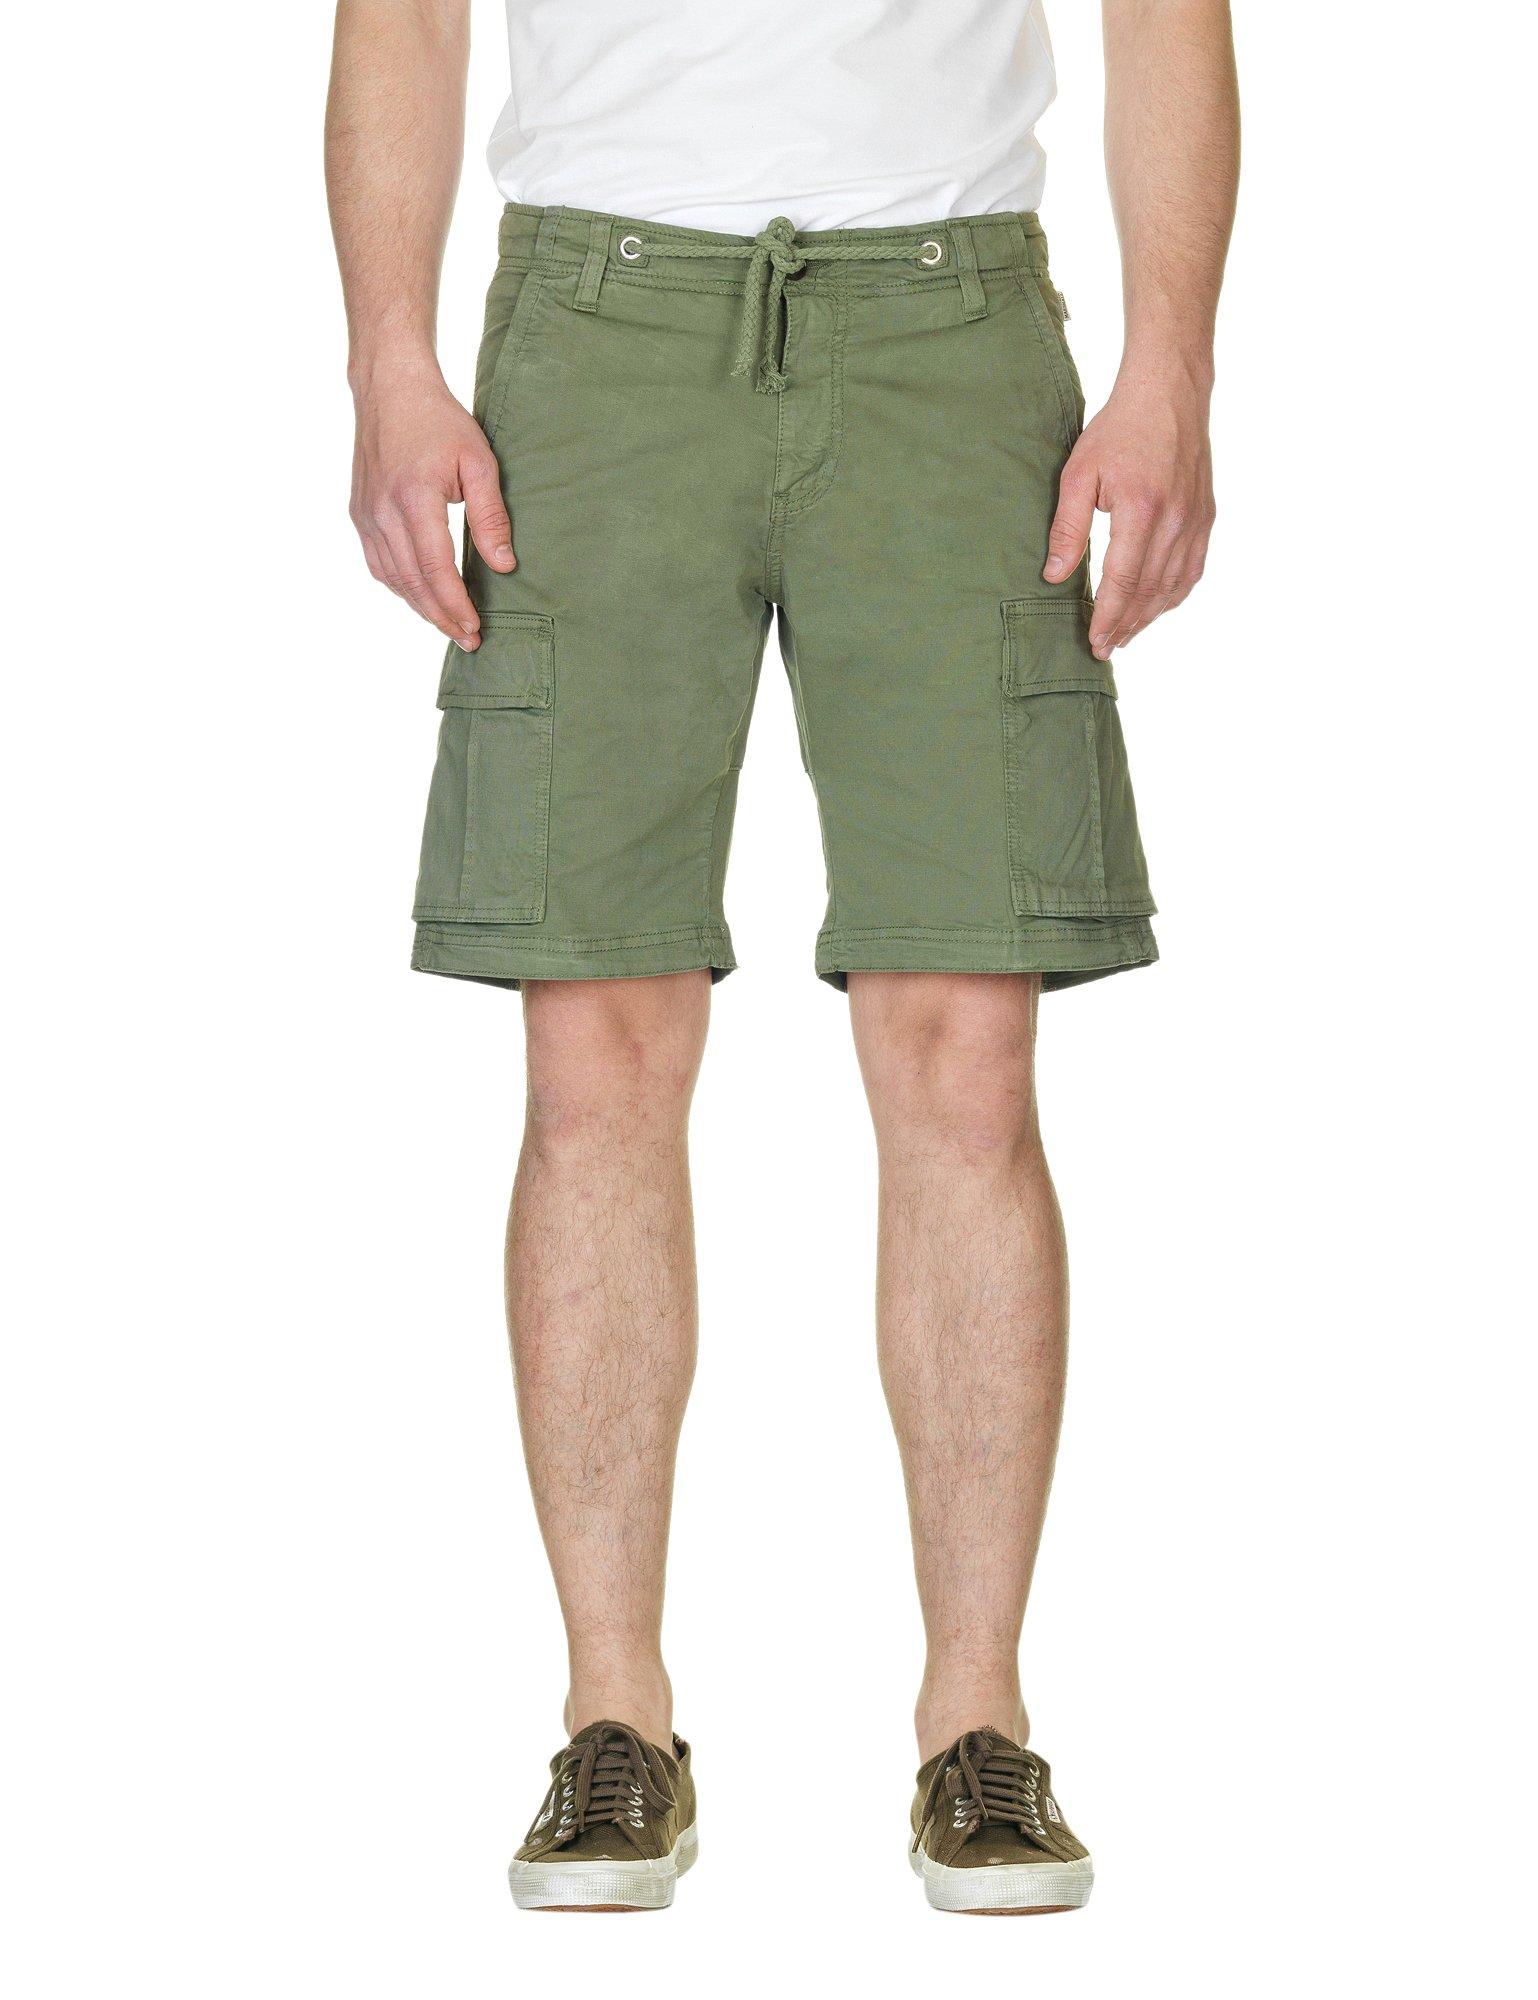 Franklin & Marshall Men's Men's Military Khaki Bermuda Shorts in Size 34 Green